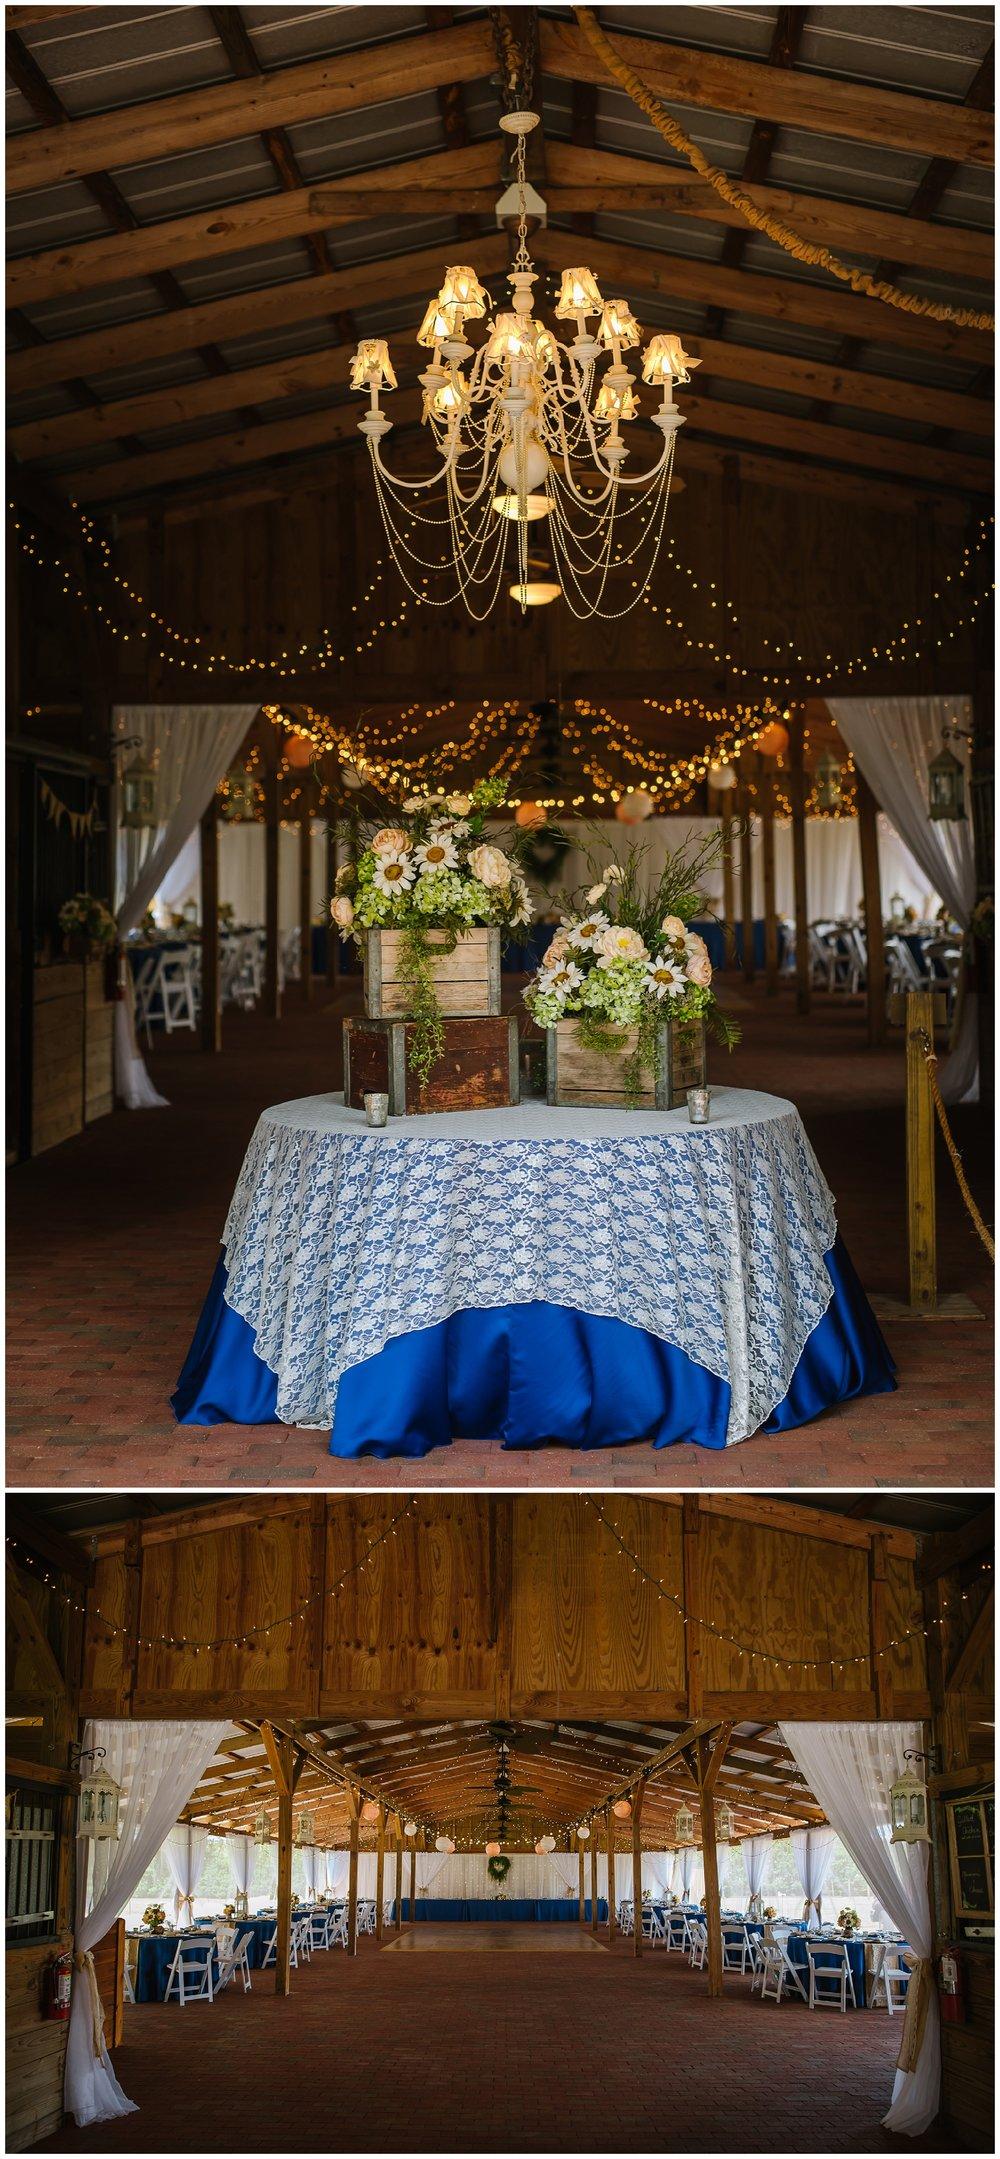 Cross-creek-ranch-navy-bush-tampa-wedding-photogrpaher_0040.jpg